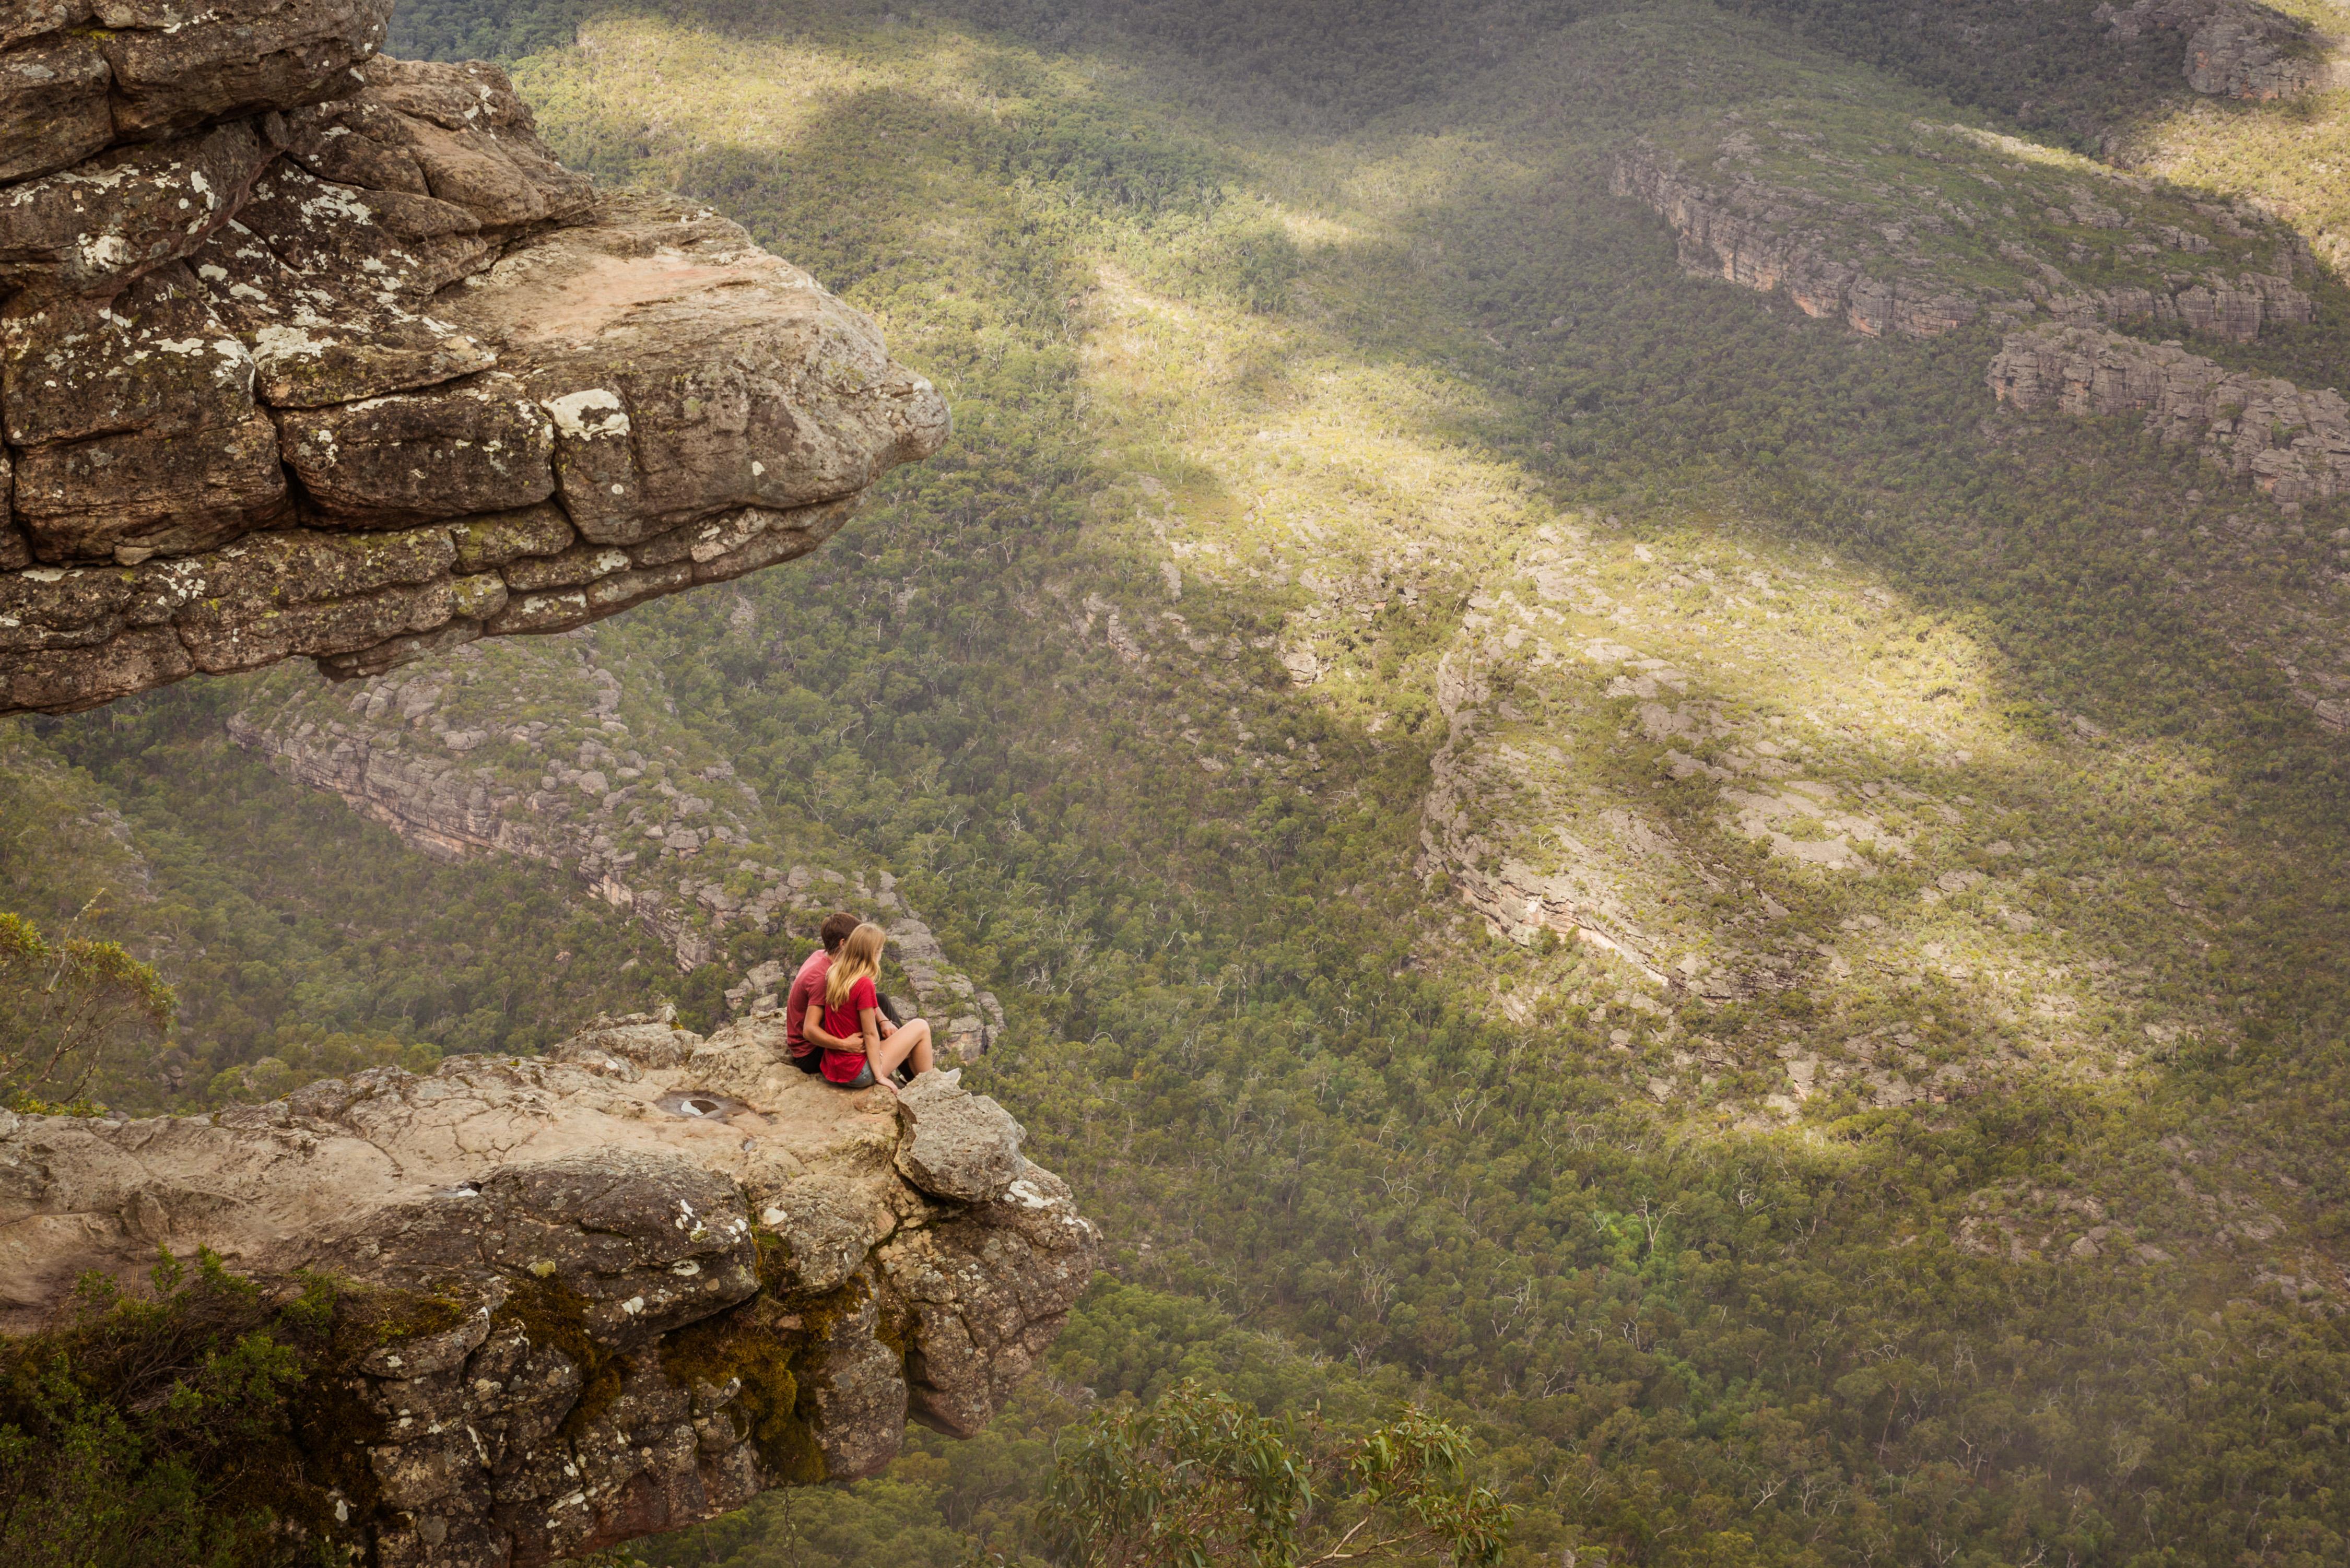 The Balconies scenic lookout famous tourist destination in Grampians National Park.